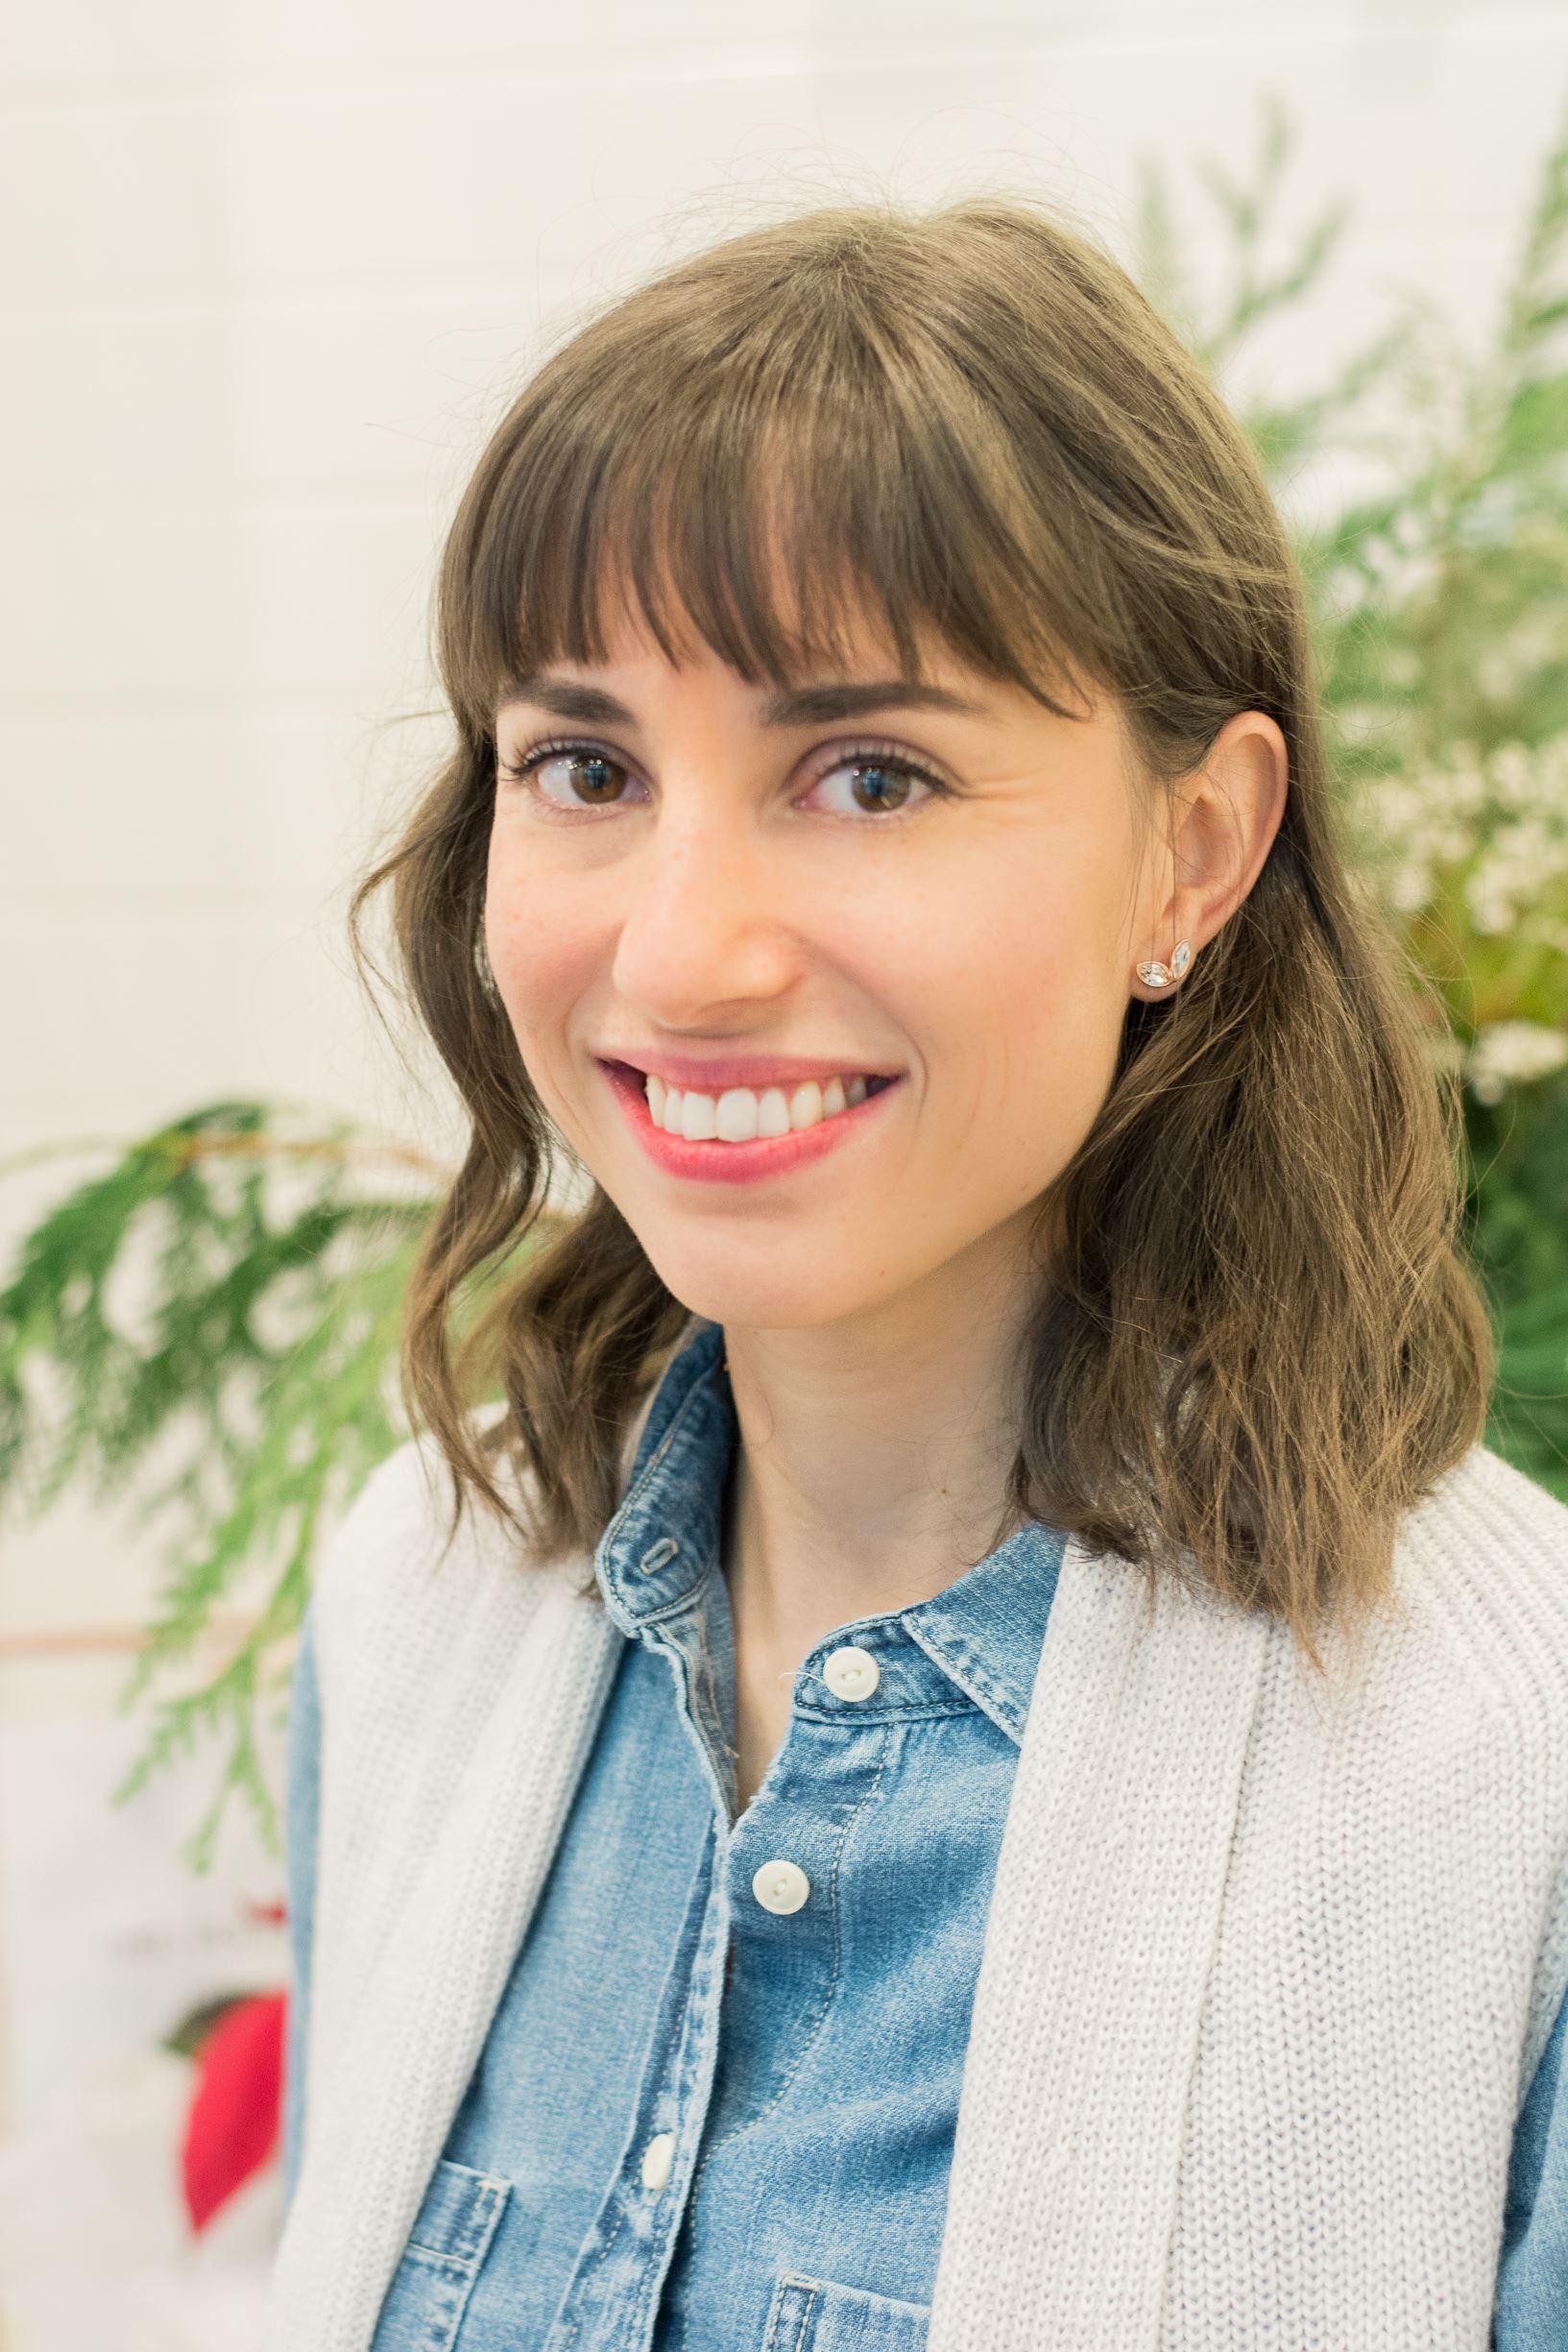 Justyna-Julia-Nutritionist-Headshot-01.jpg